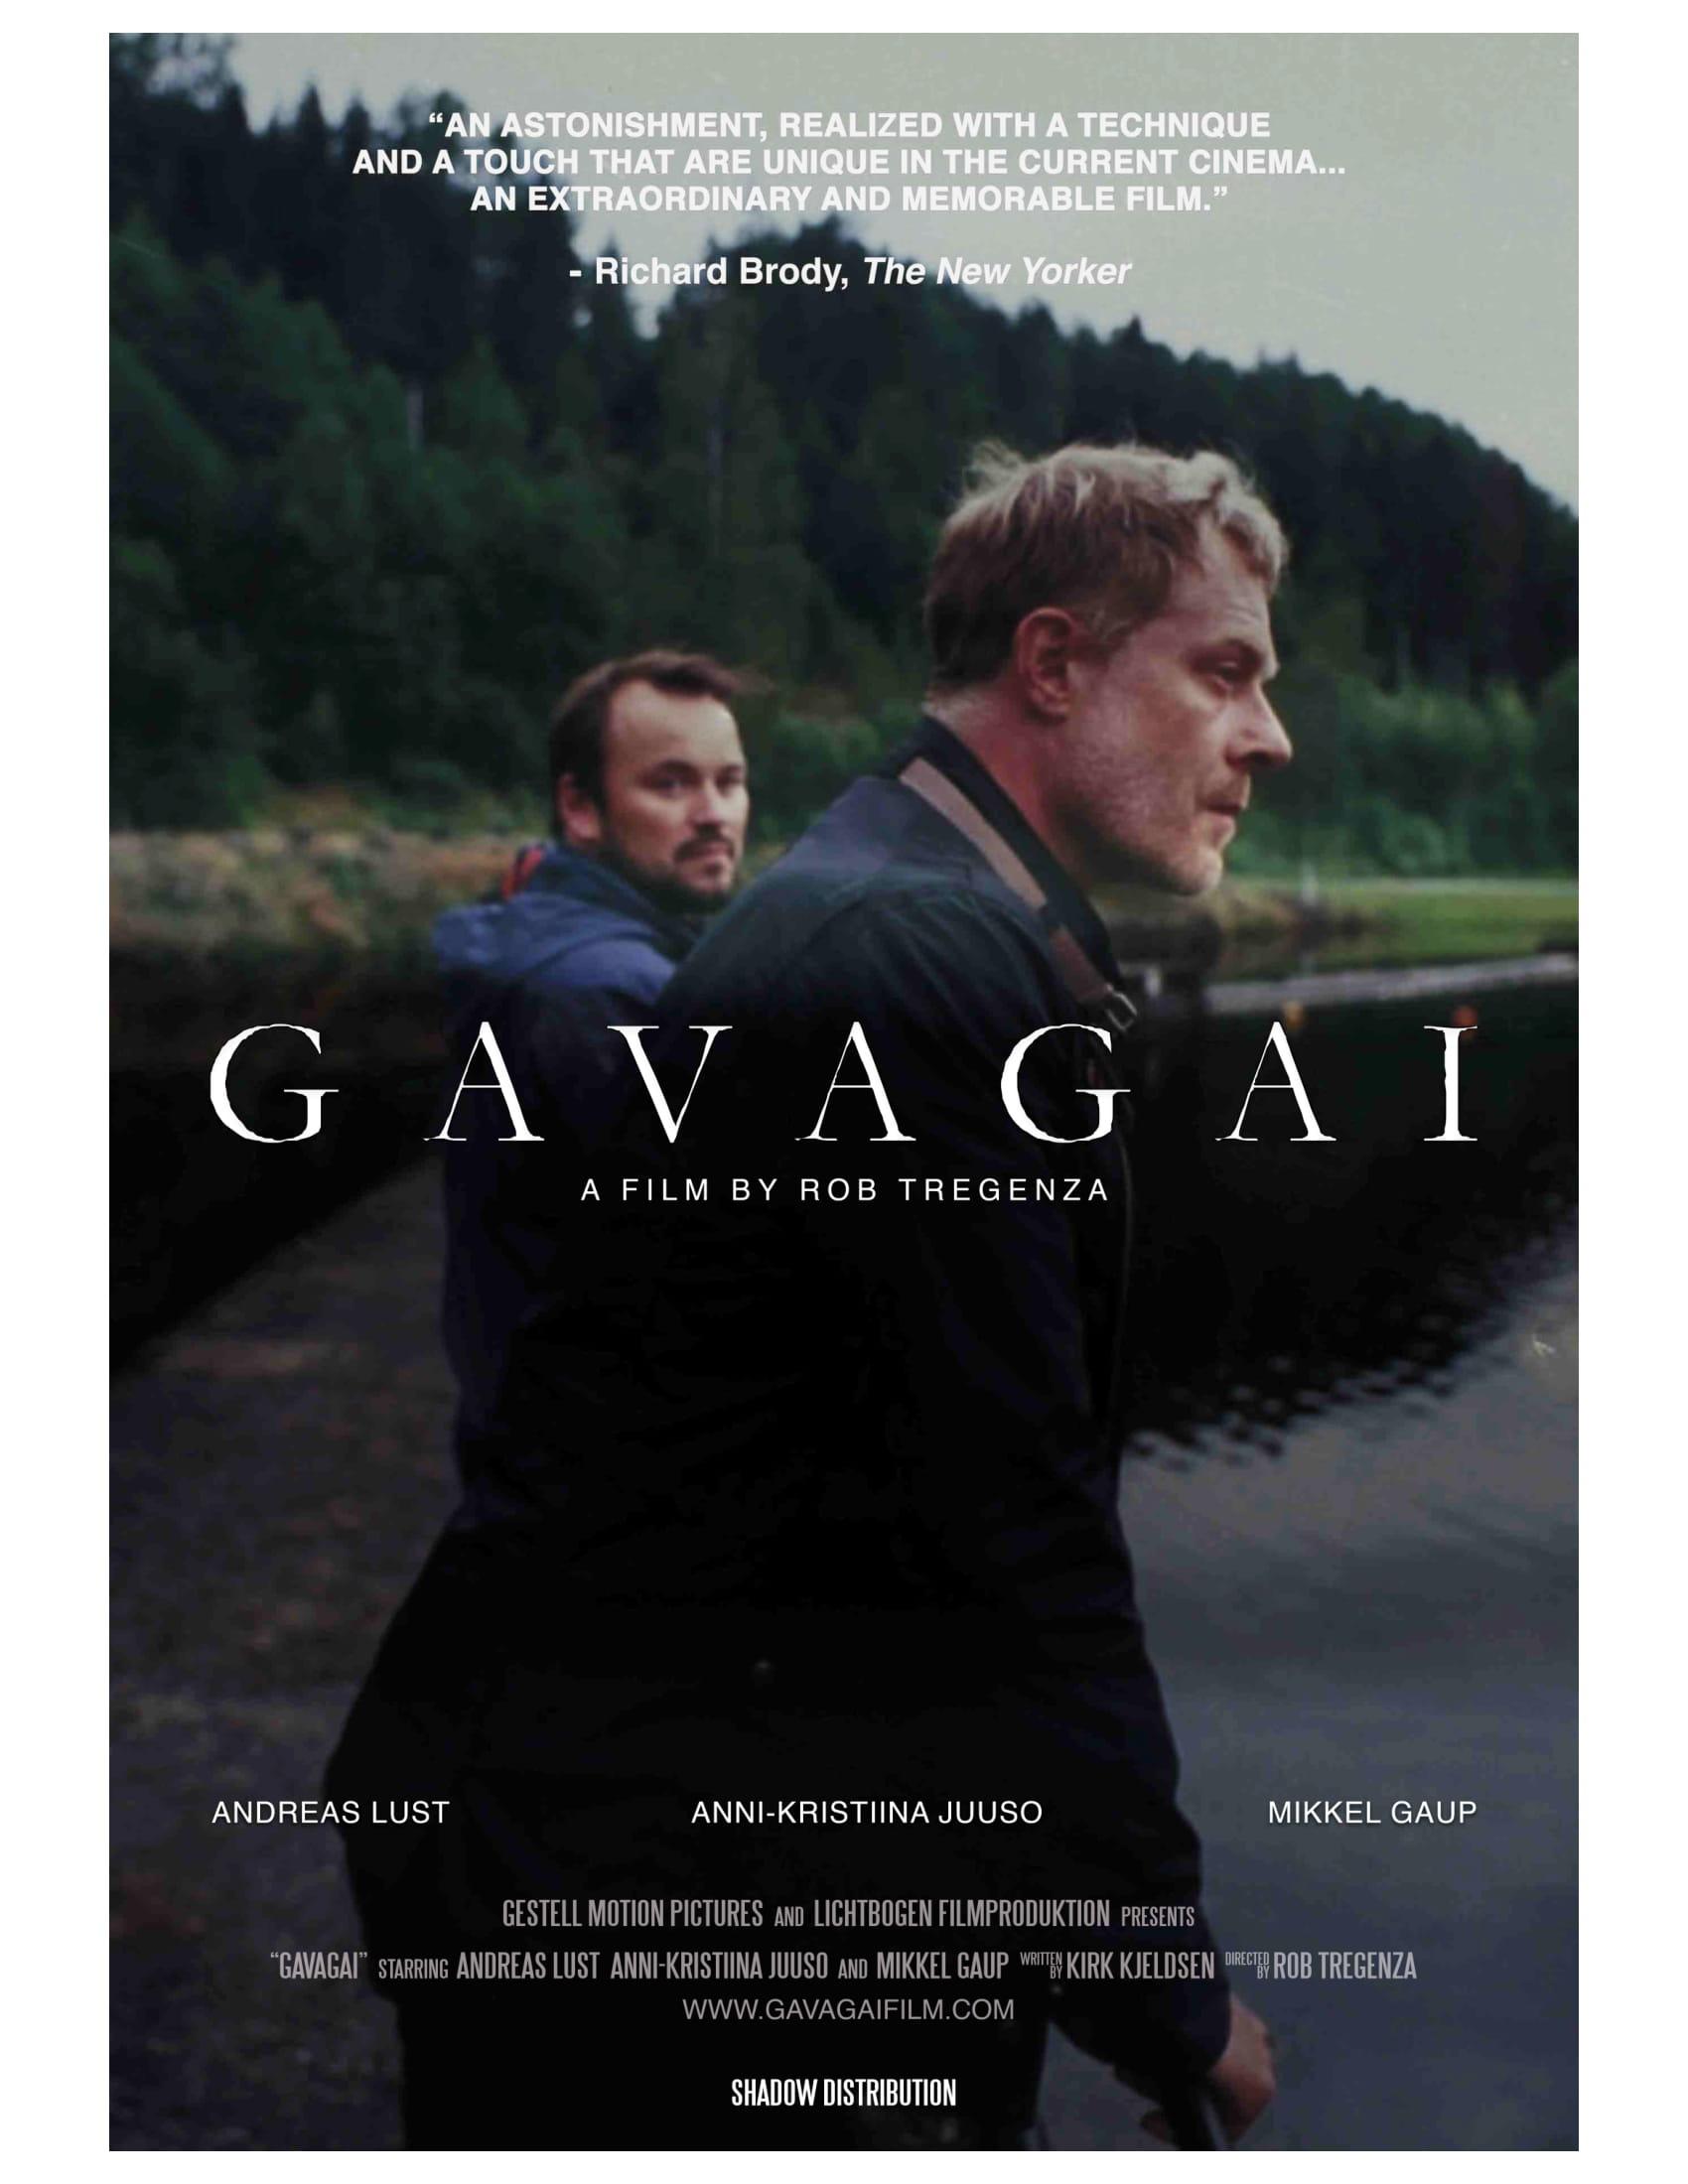 GAVAGAIPOSTER_V2-1.jpg